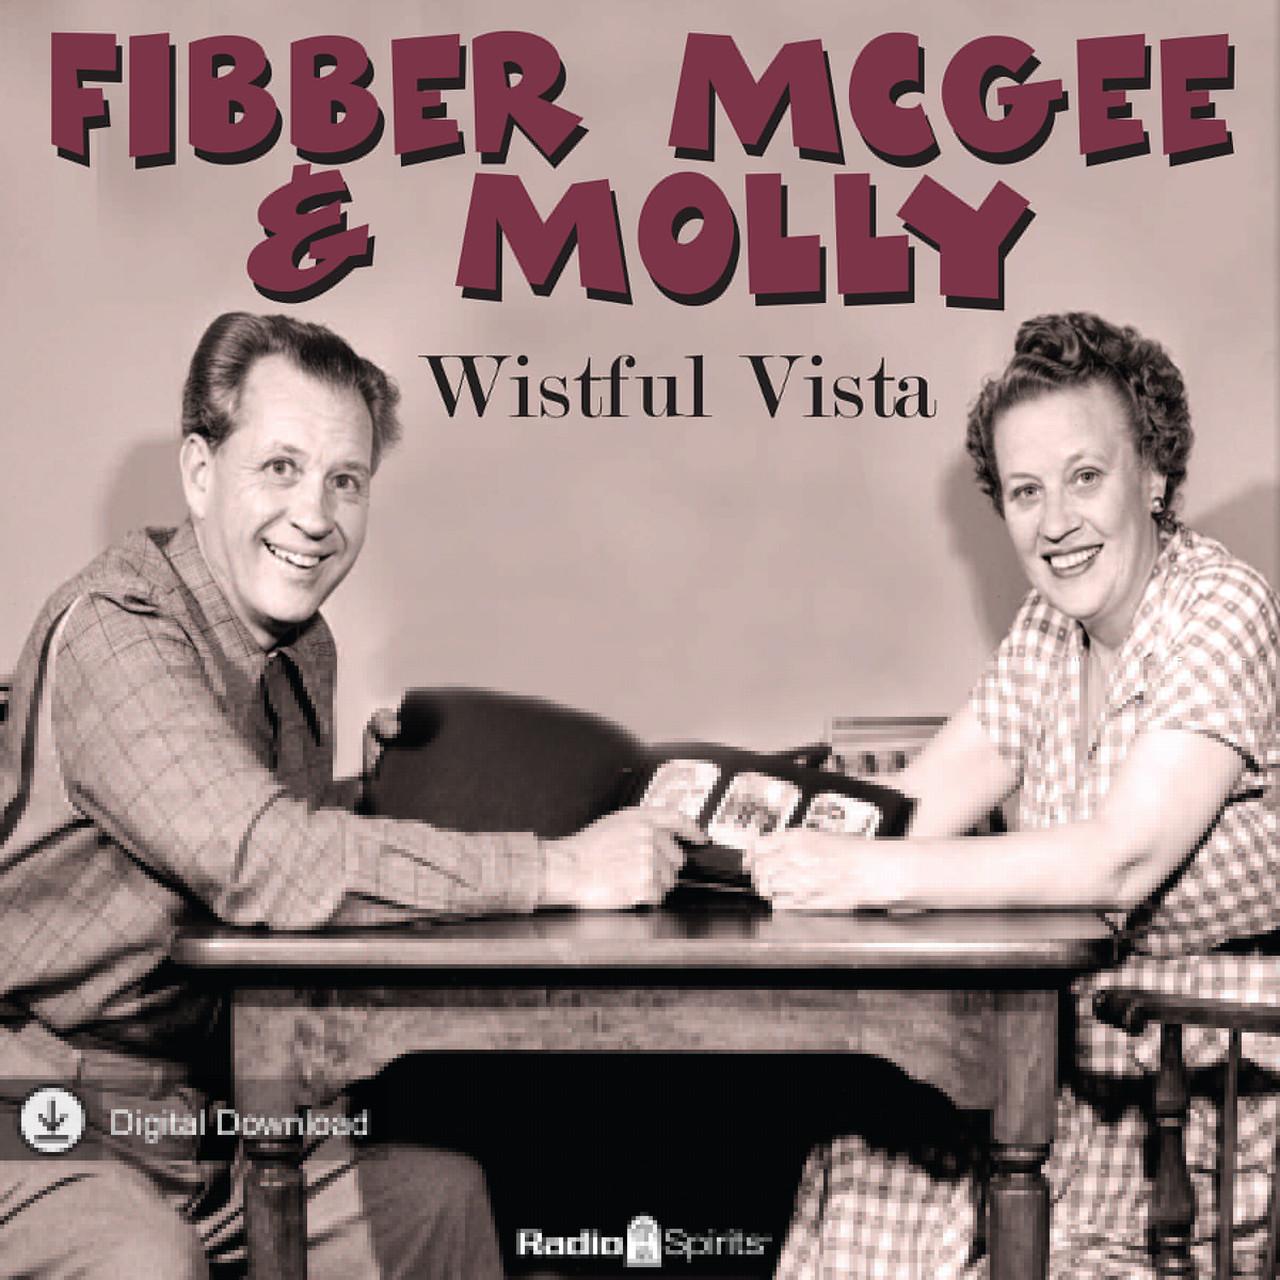 Fibber McGee & Molly: Wistful Vista (MP3 Download)